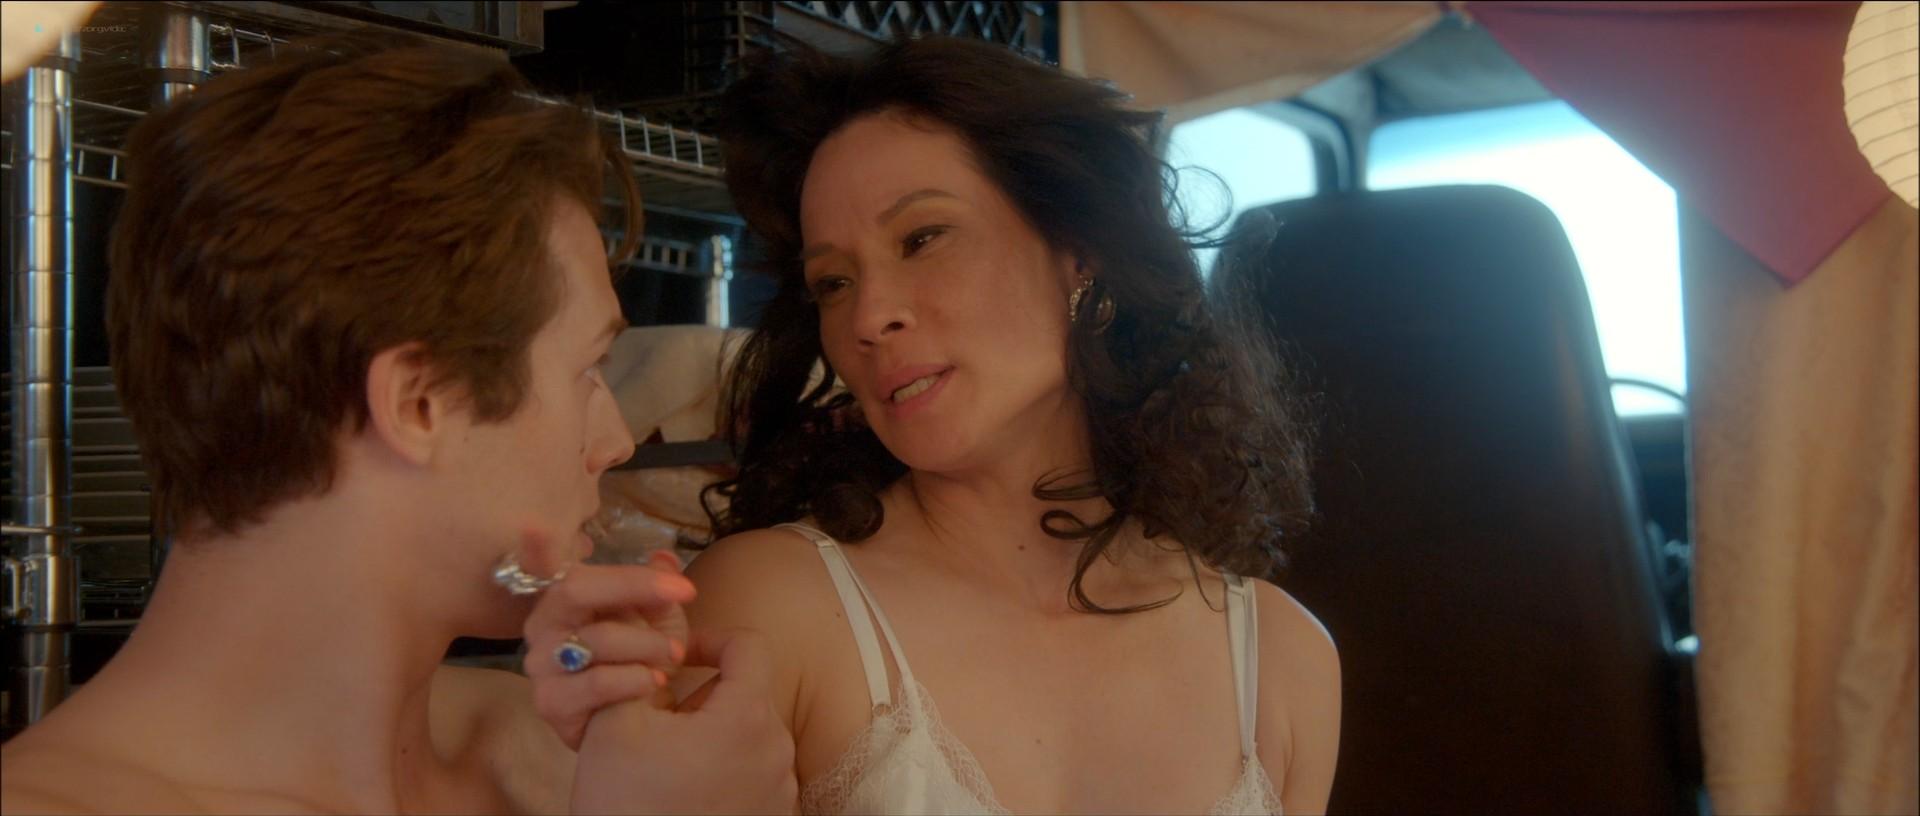 Alexandra Daddario sexy Lucy Liu hot and some sex - Why Women Kill (2019) s1e3 HD 1080p Web (11)